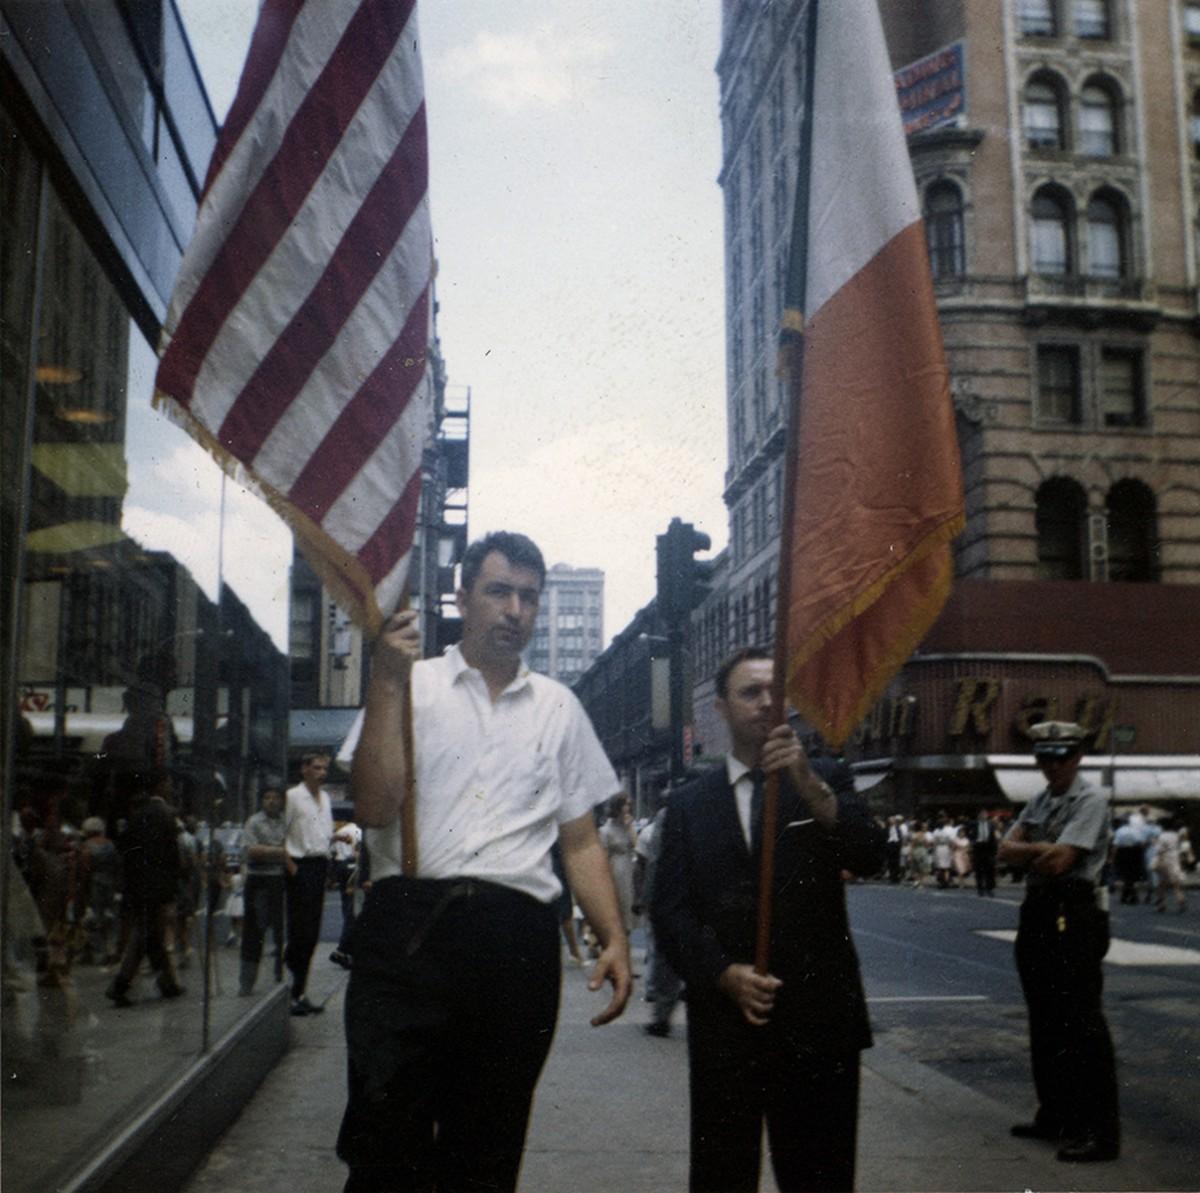 Conlon // Philadelphia & County Monaghan :: Vincent Conlon taking part in the St Patricks Day Parade, Philadelphia, 1960s